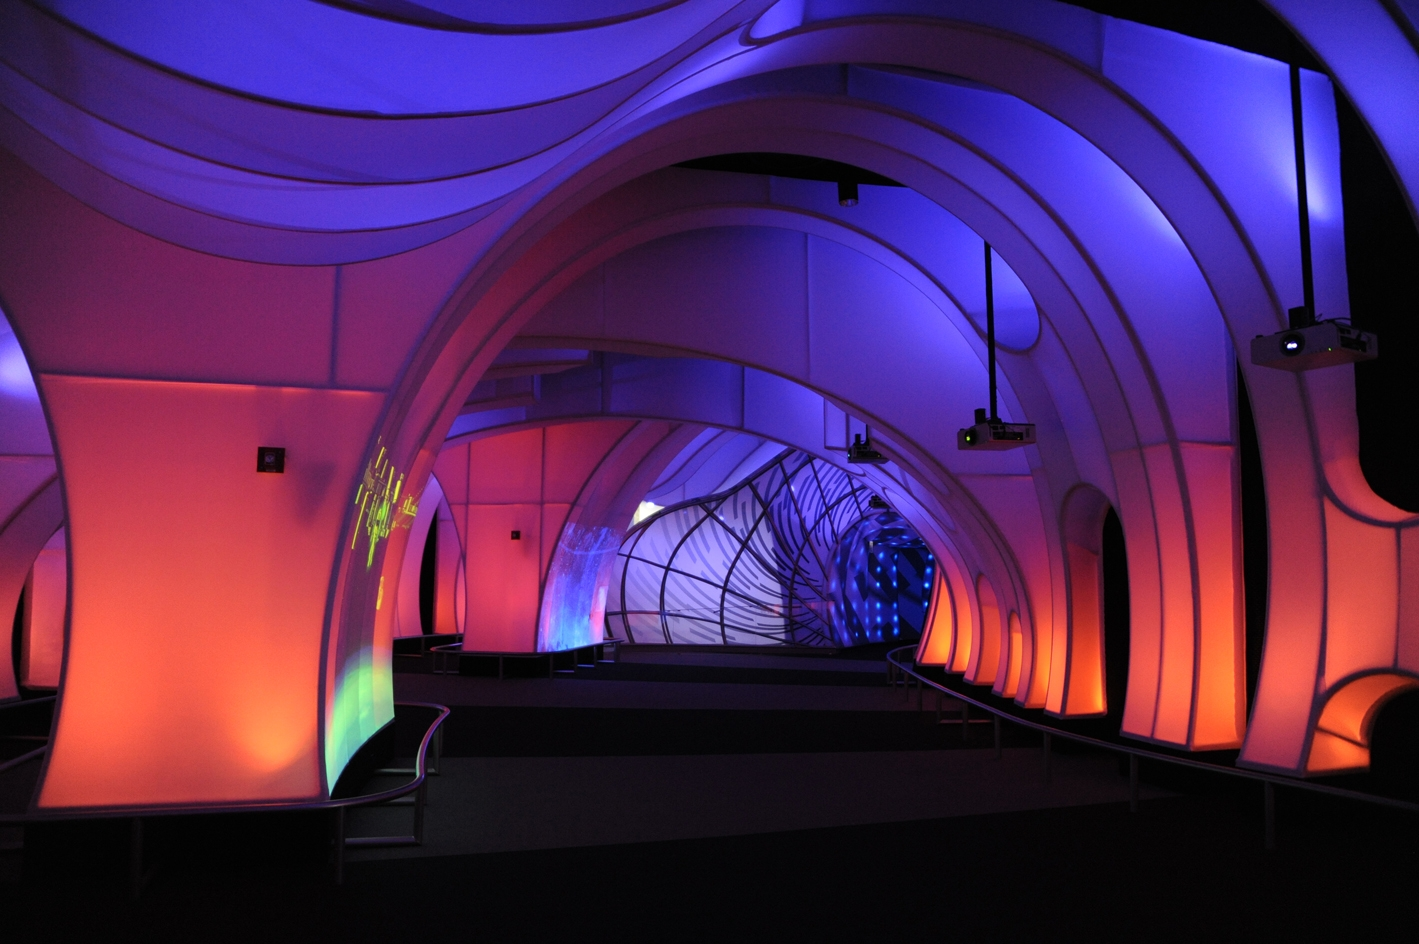 Clark Family Welcome Gallery - Adler Planetarium